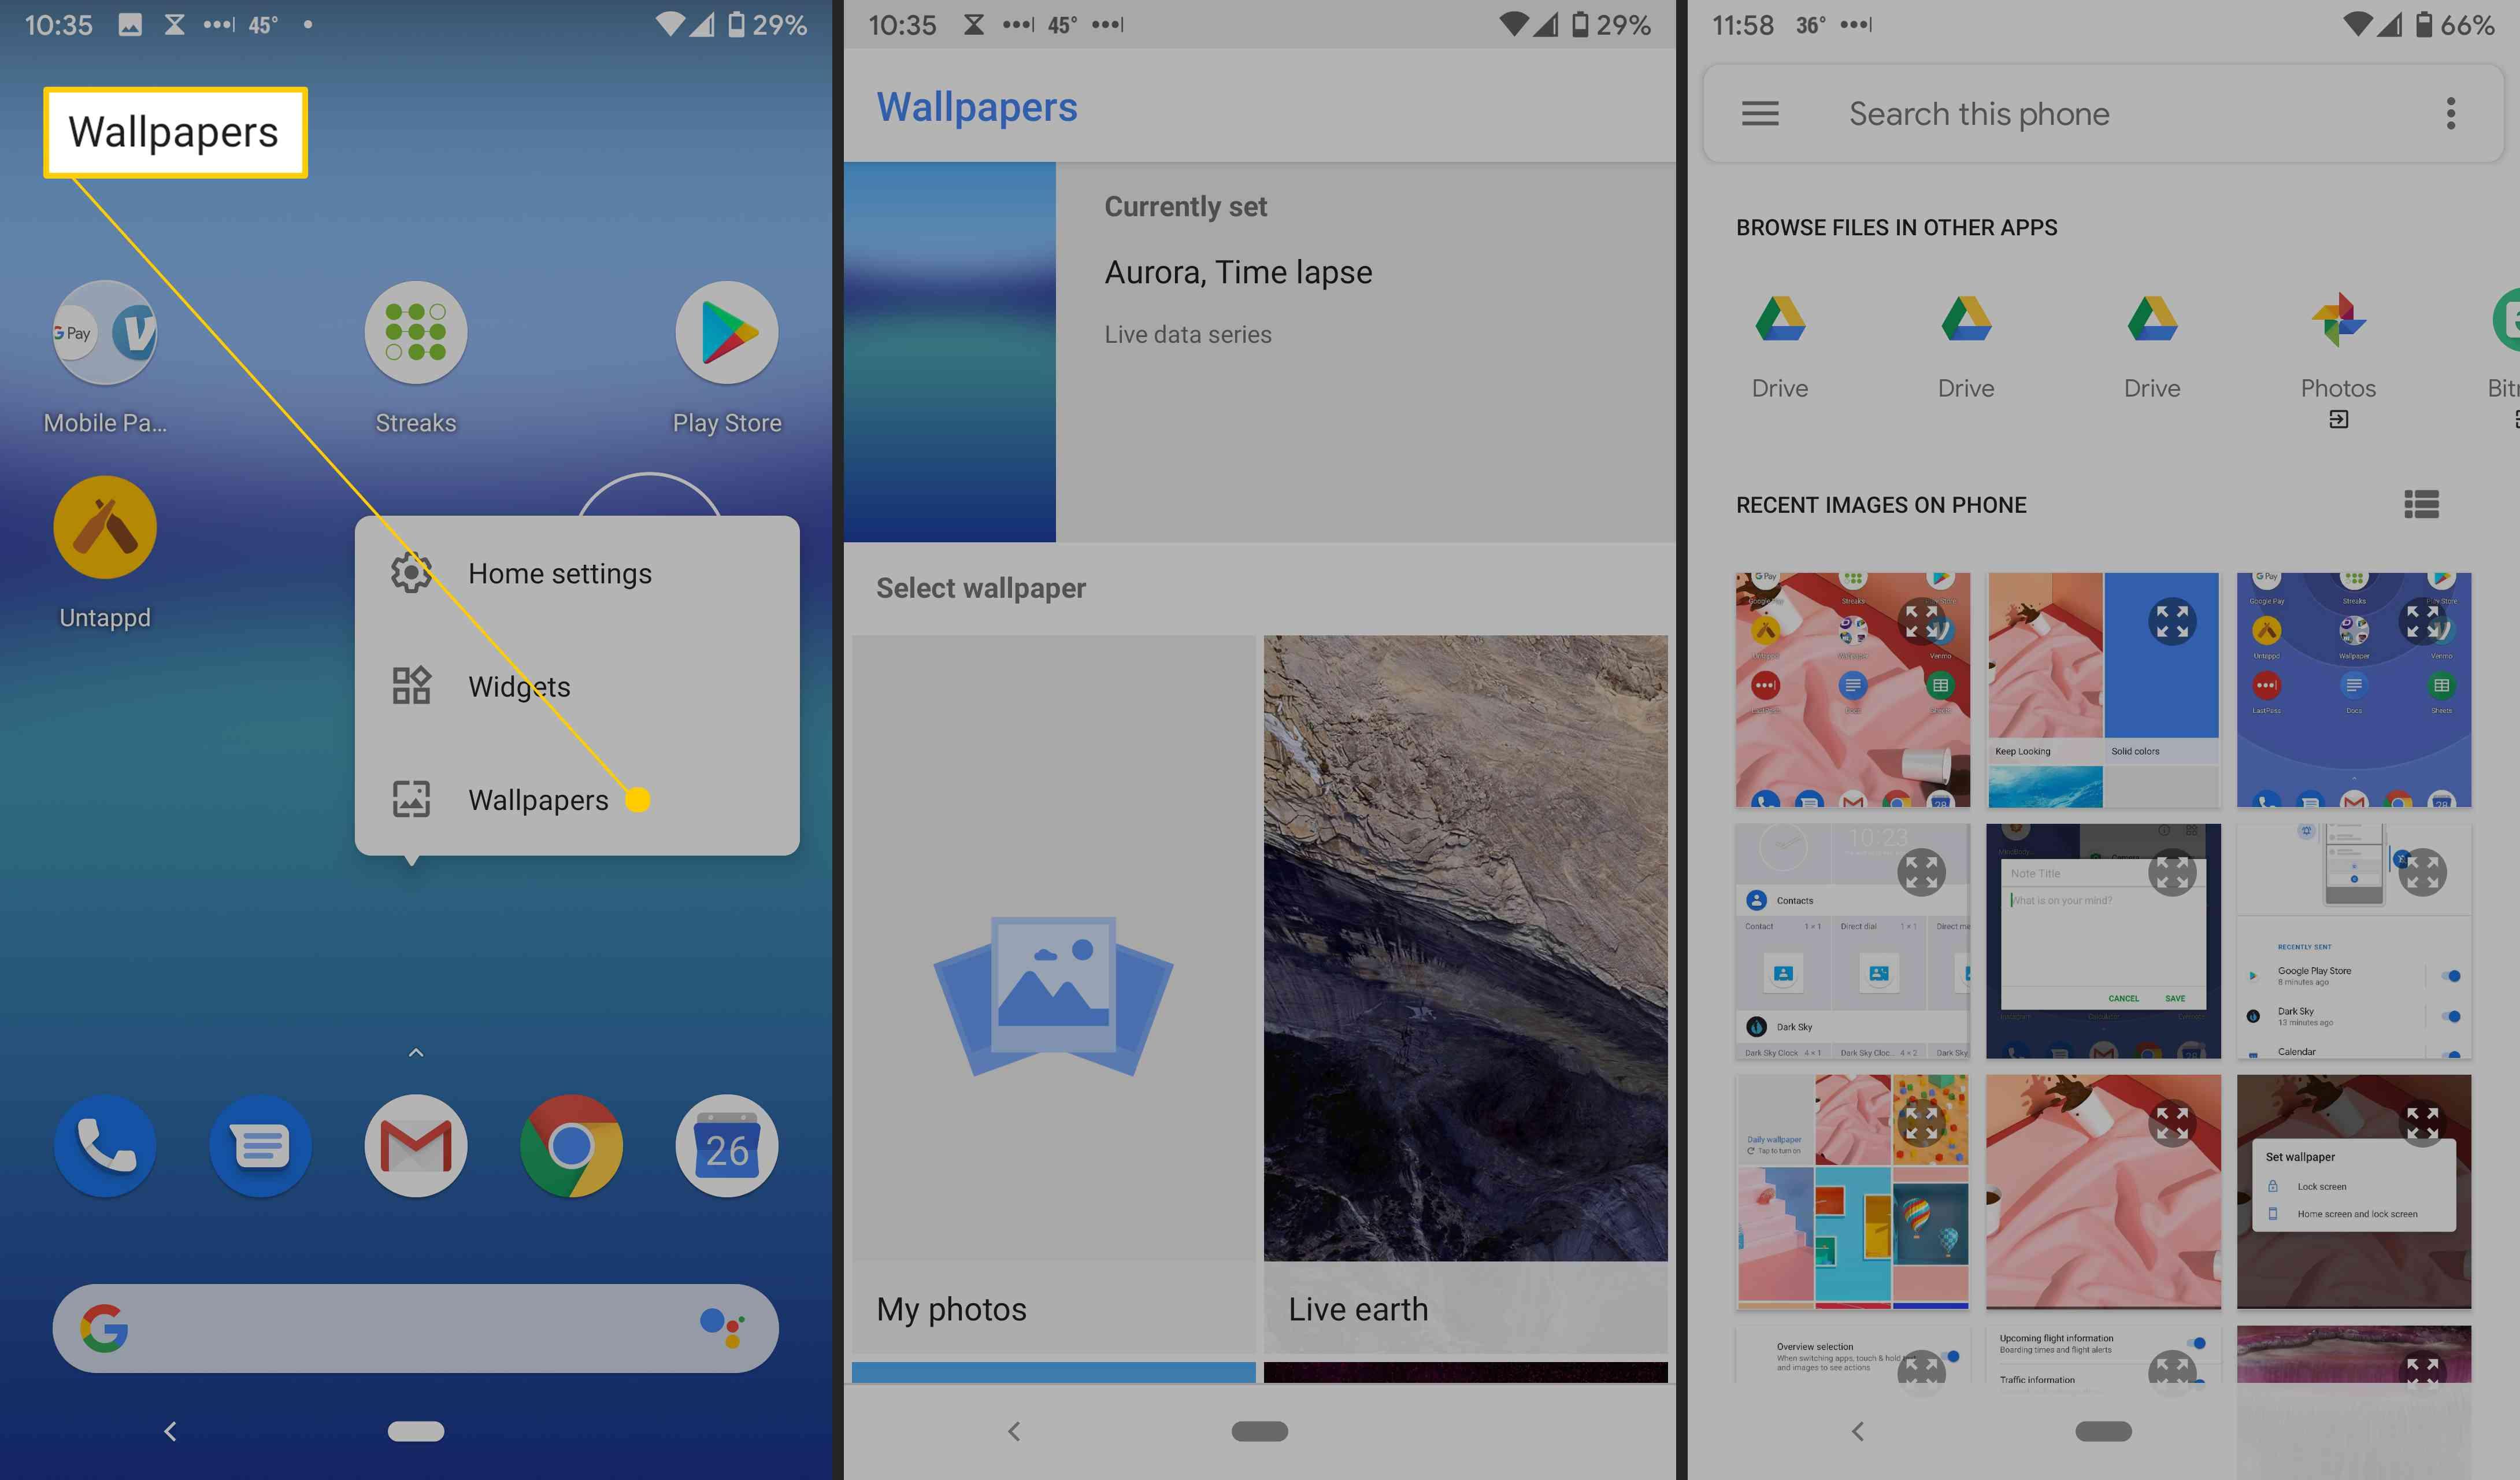 Home screen wallpaper options.